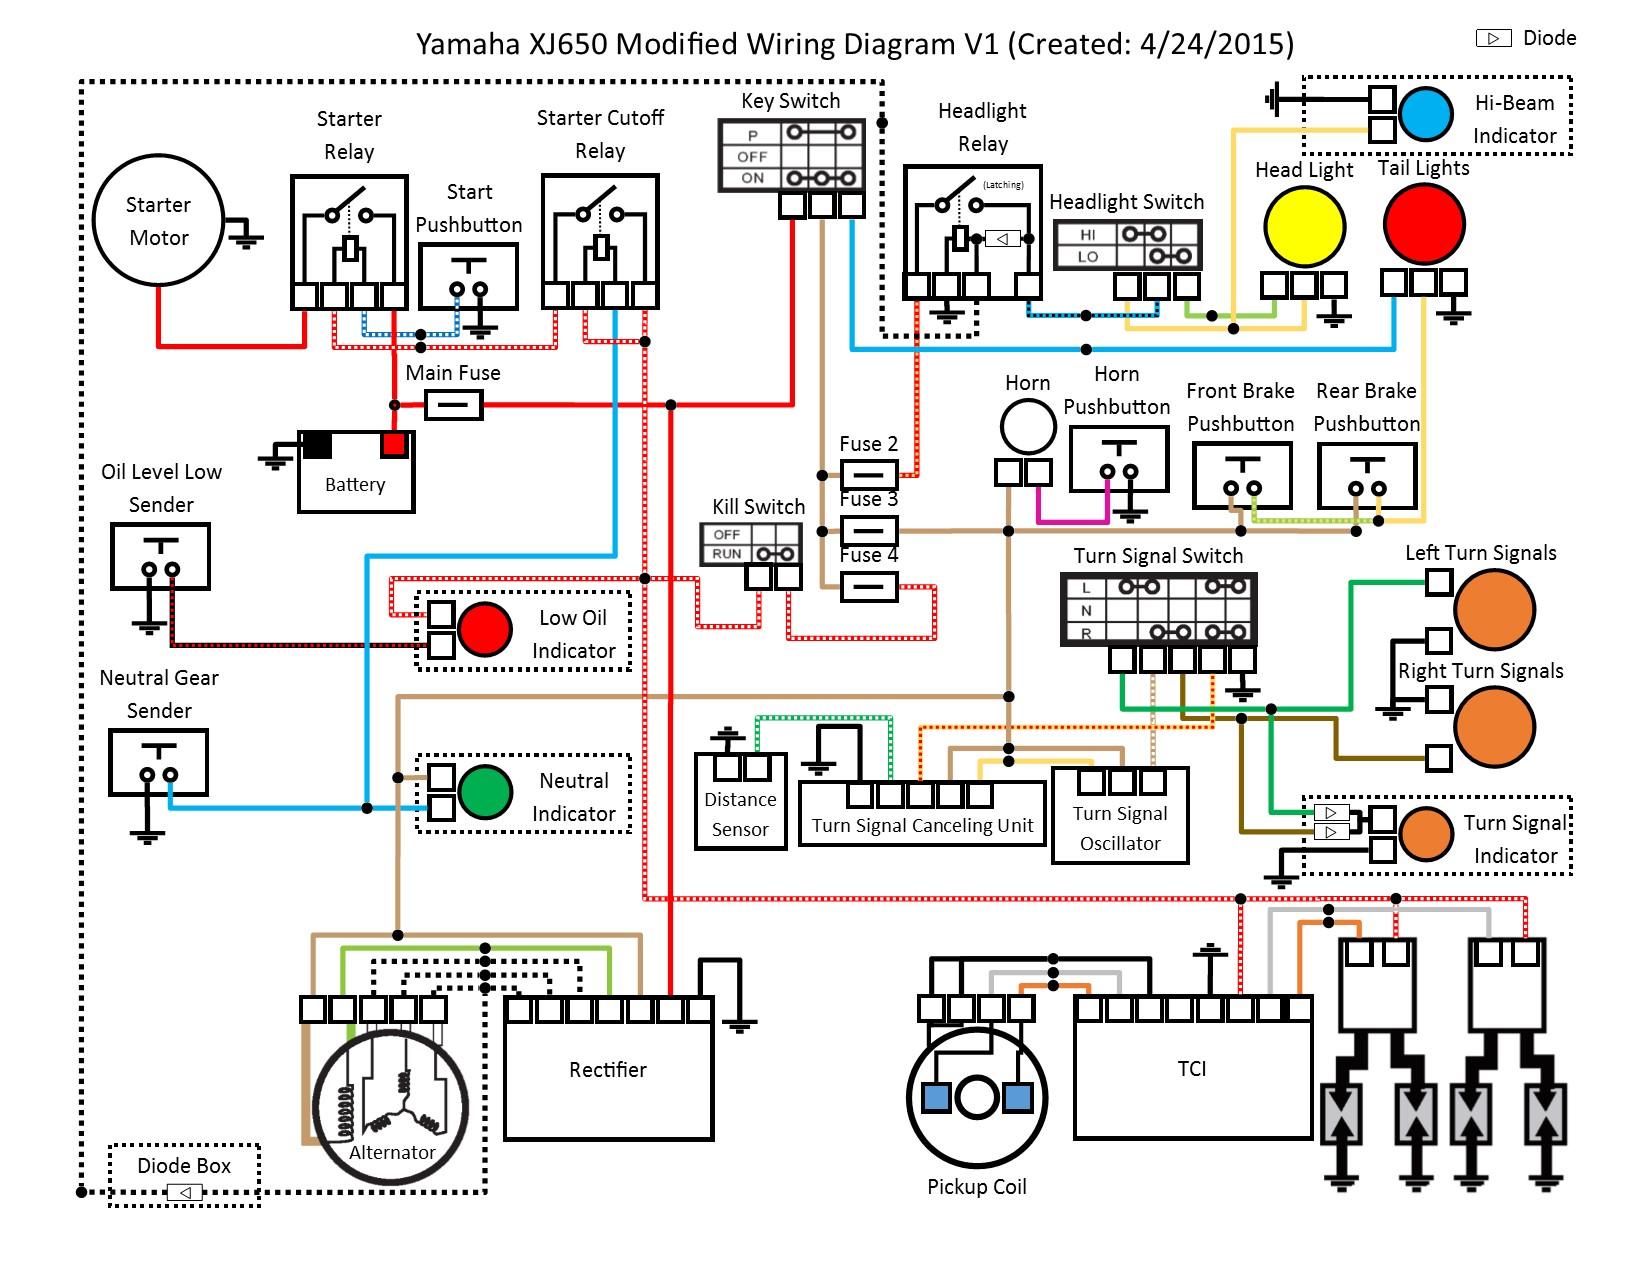 Yamaha Xj650 Wiring Code - wiring diagram ground-control -  ground-control.rilievo3d.it | 1980 Yamaha Xj650 Wiring Diagram |  | rilievo3d.it